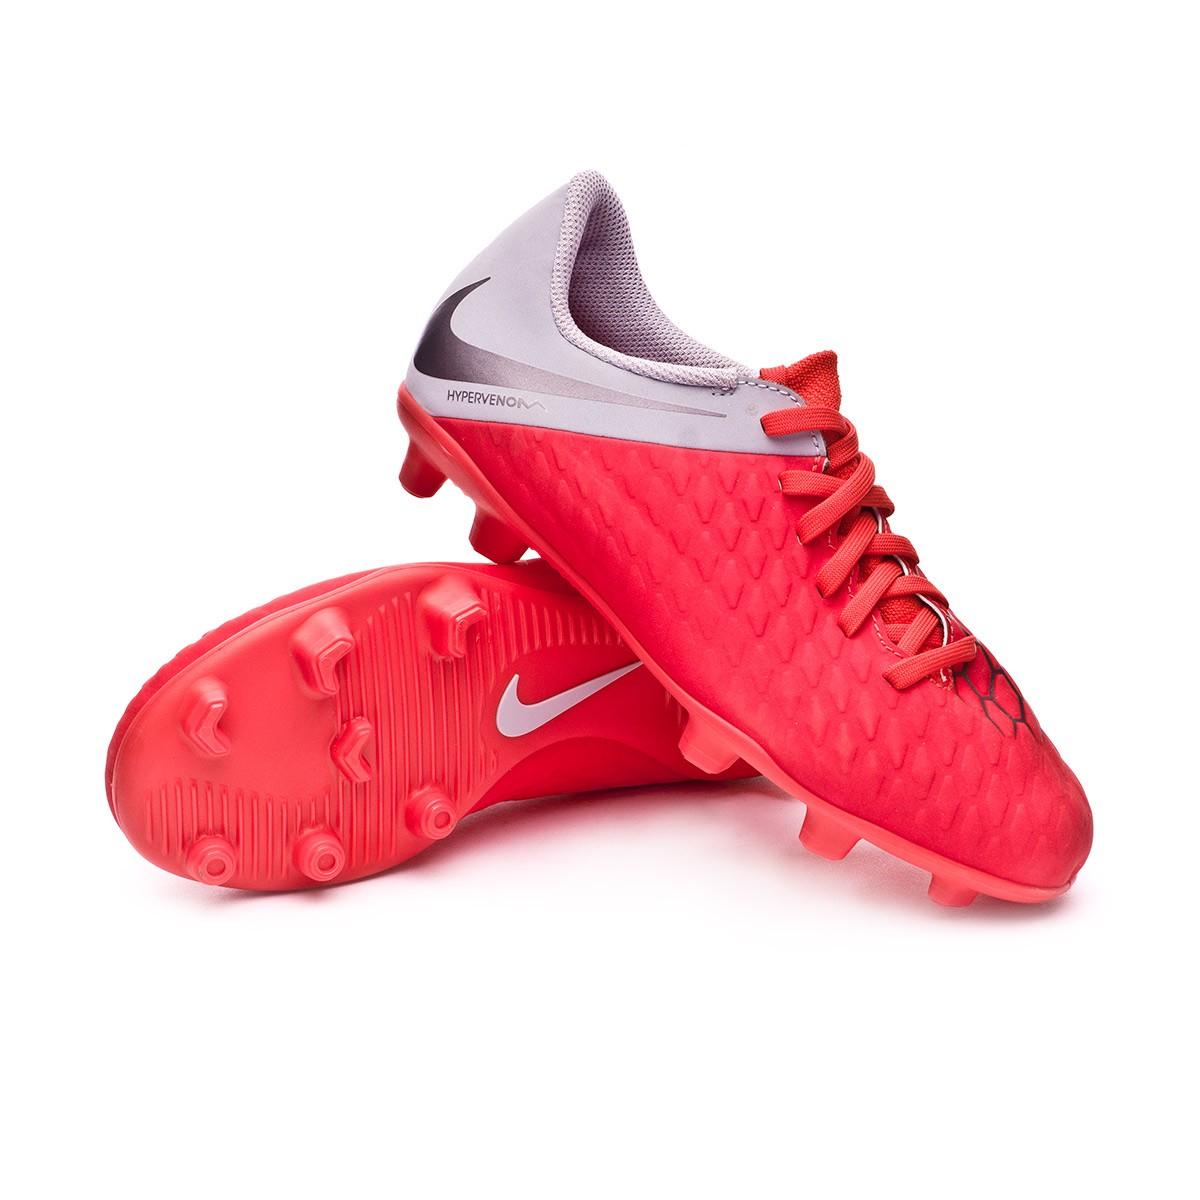 d17cb5ec1 Football Boots Nike Kids Hypervenom Phantom III Club FG Light  crimson-Metallic dark grey-Wolf grey - Football store Fútbol Emotion